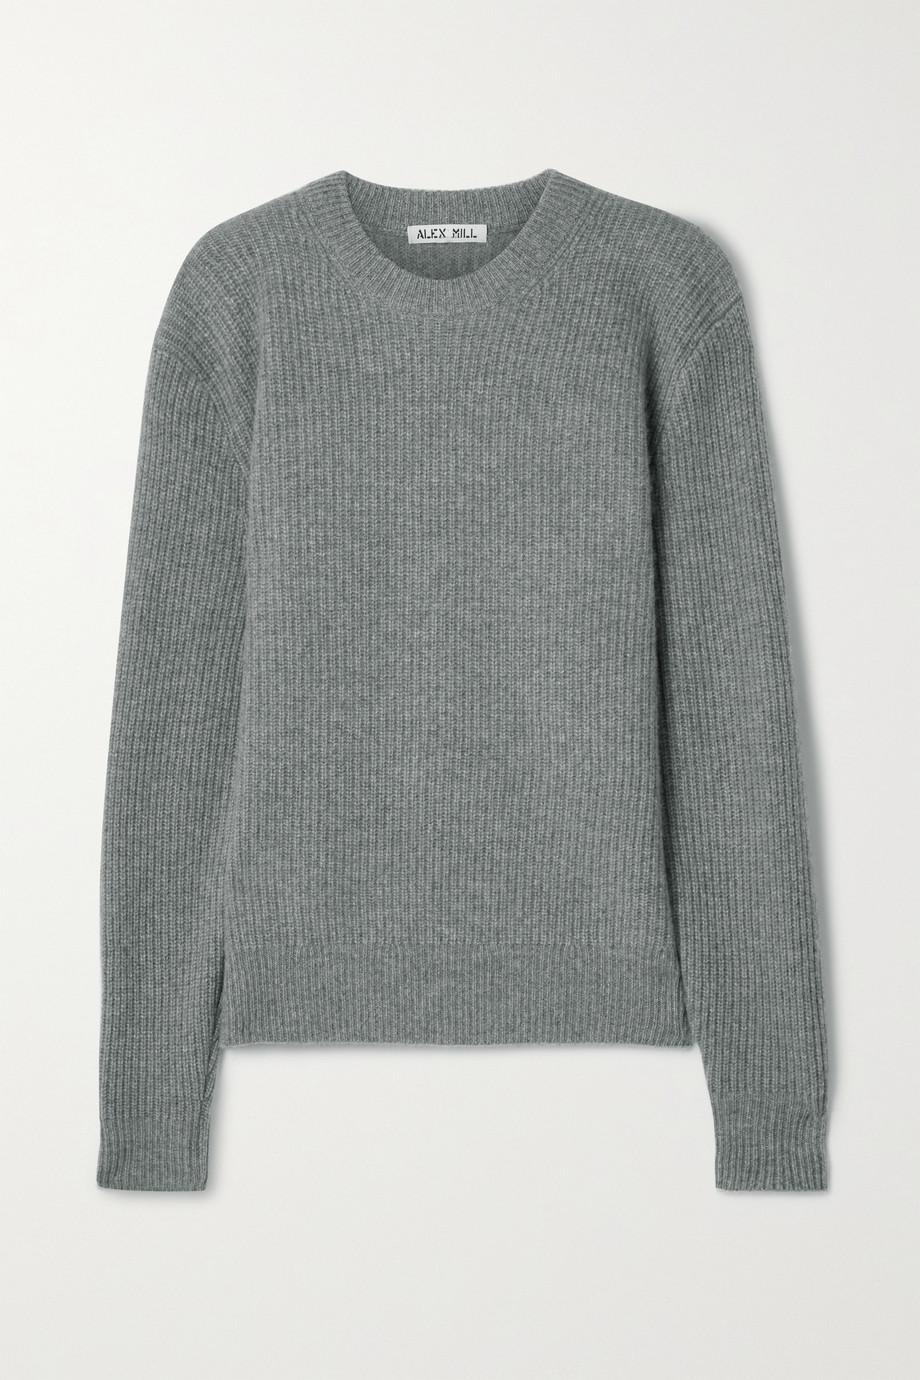 Alex Mill Jordan ribbed cashmere sweater